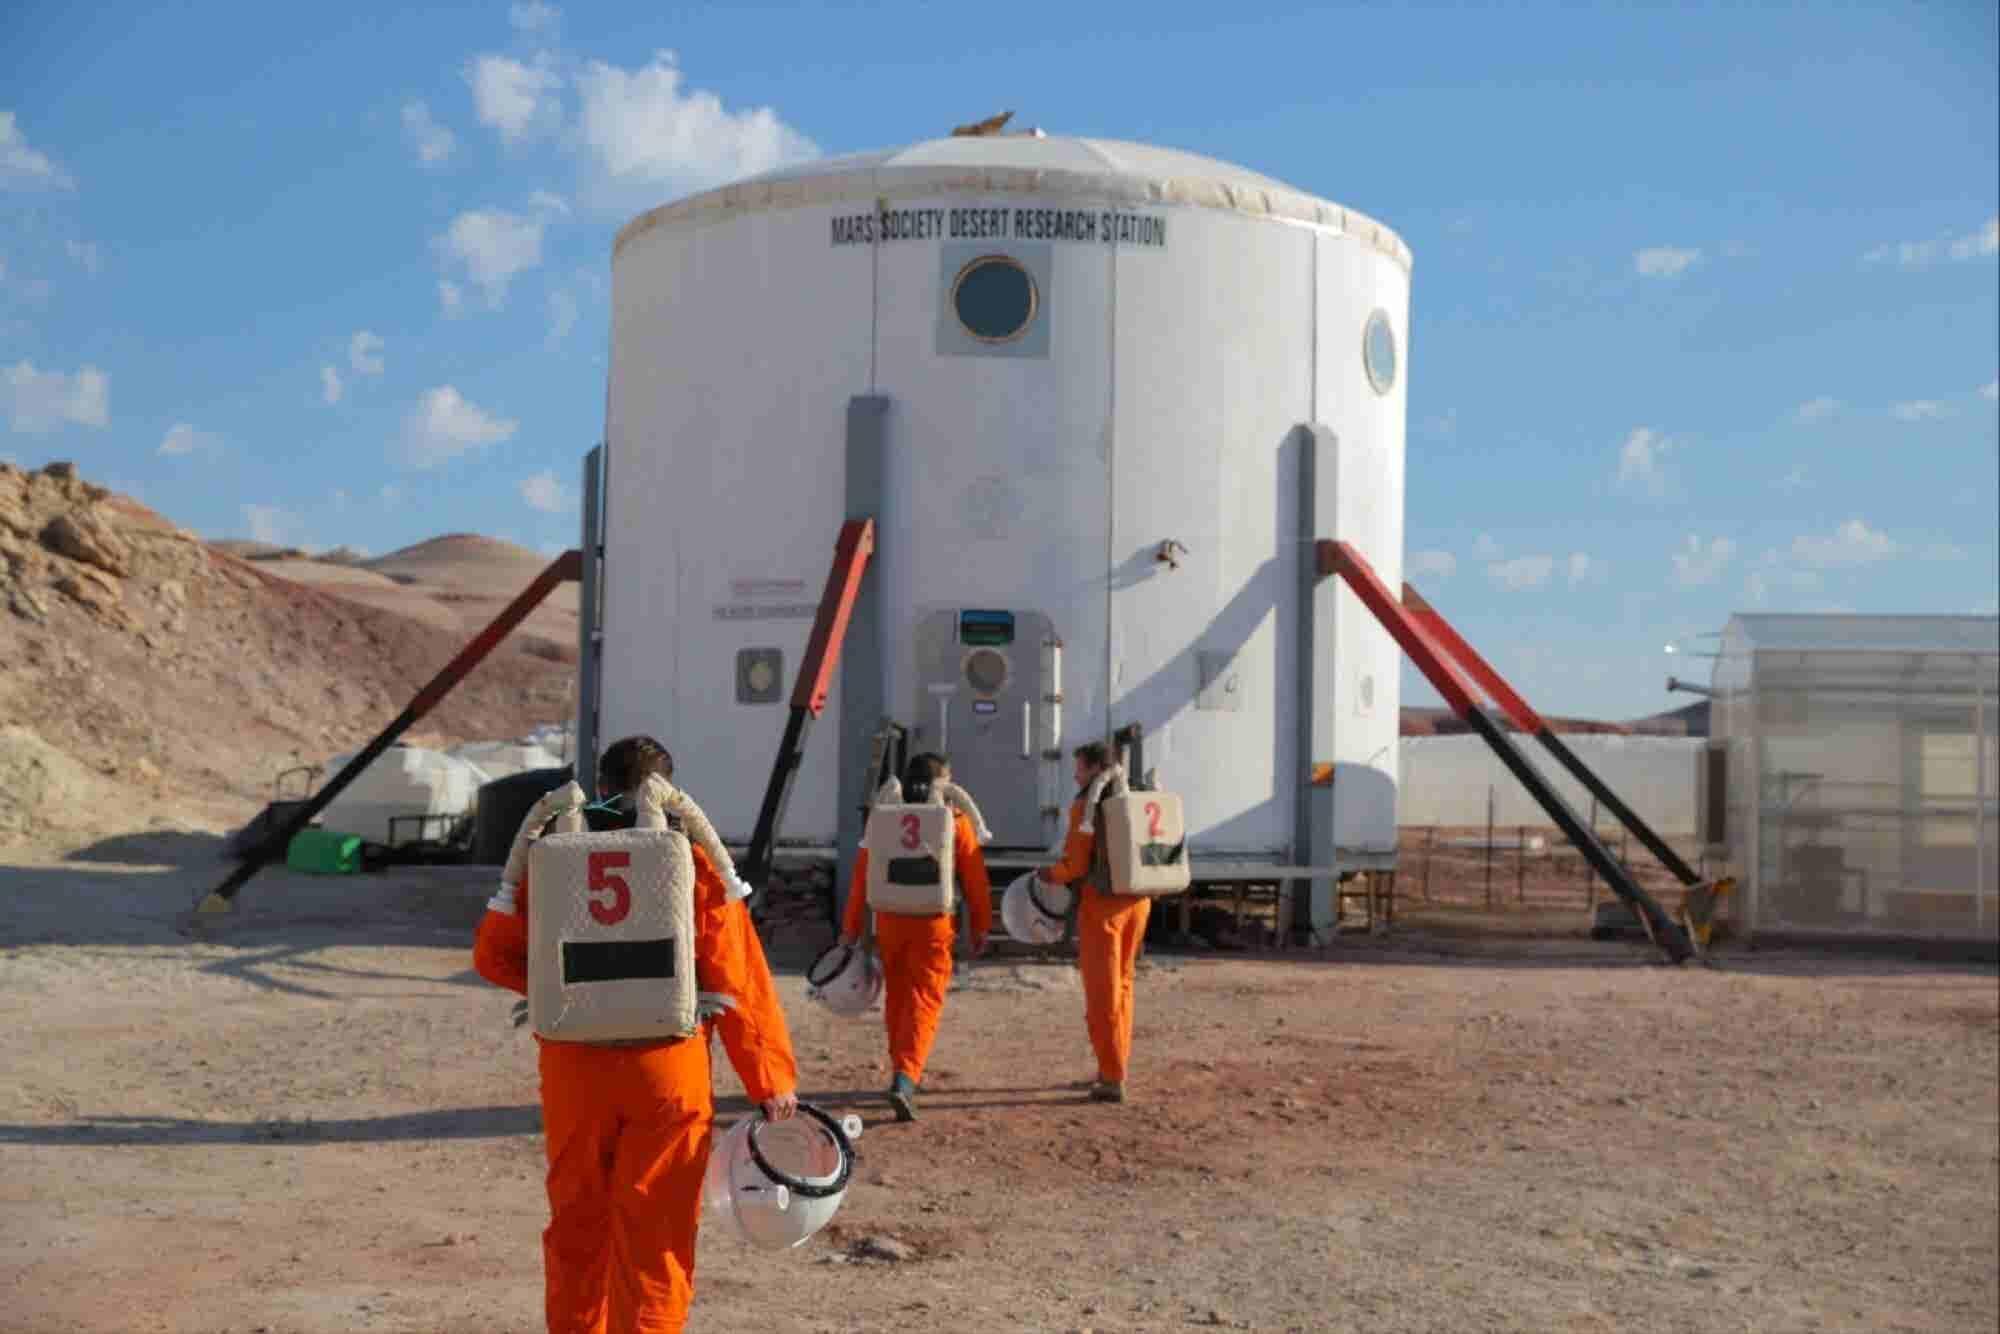 Ikea Designers Using Mars Simulator for Ideas Understand a Secret About Creativity